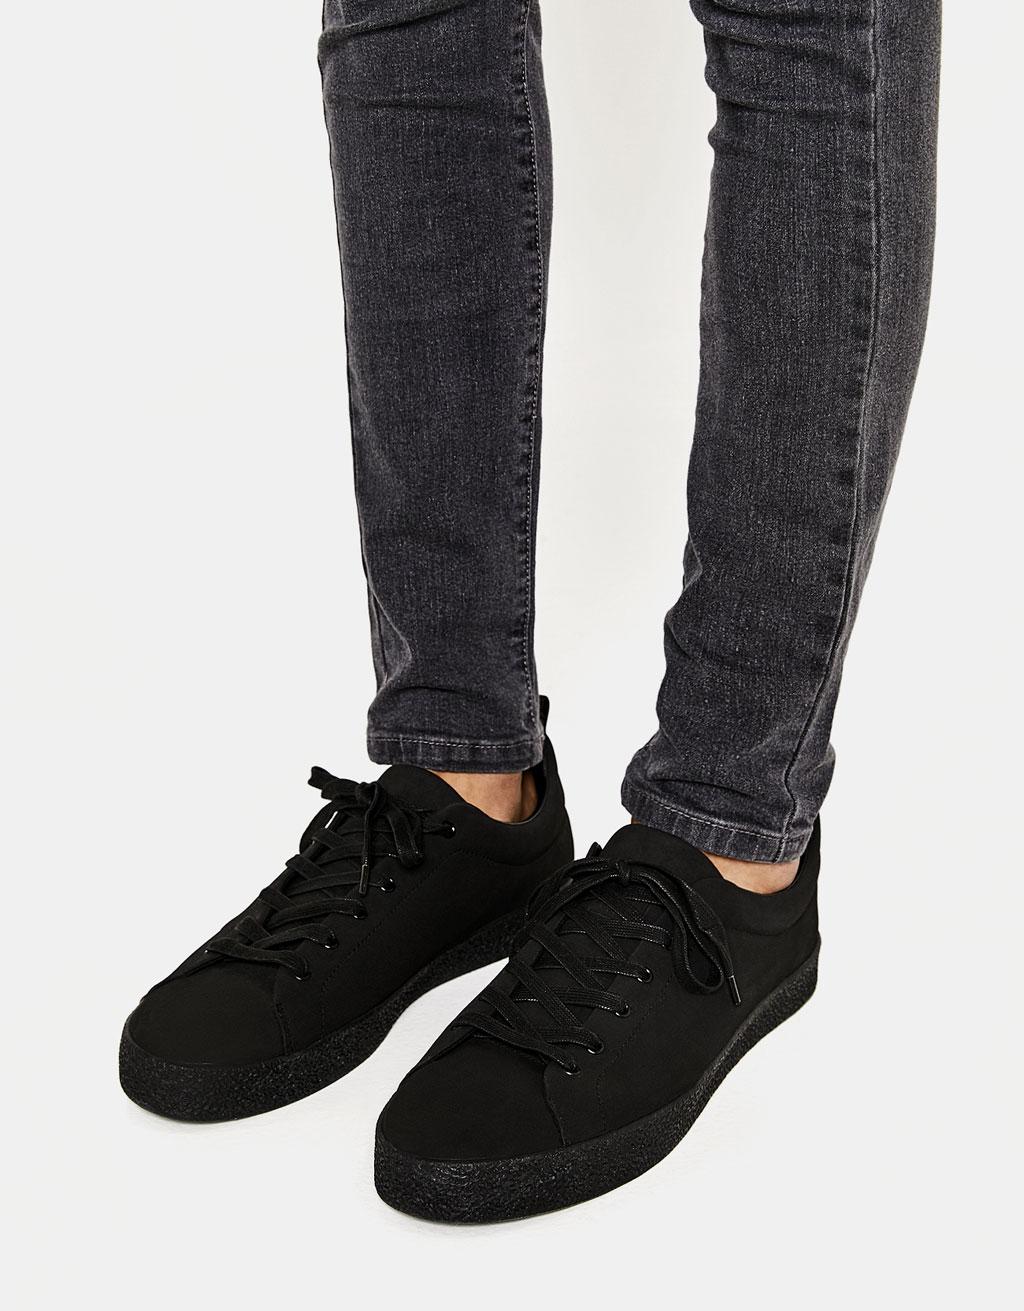 Zapatilla negra suela textura hombre